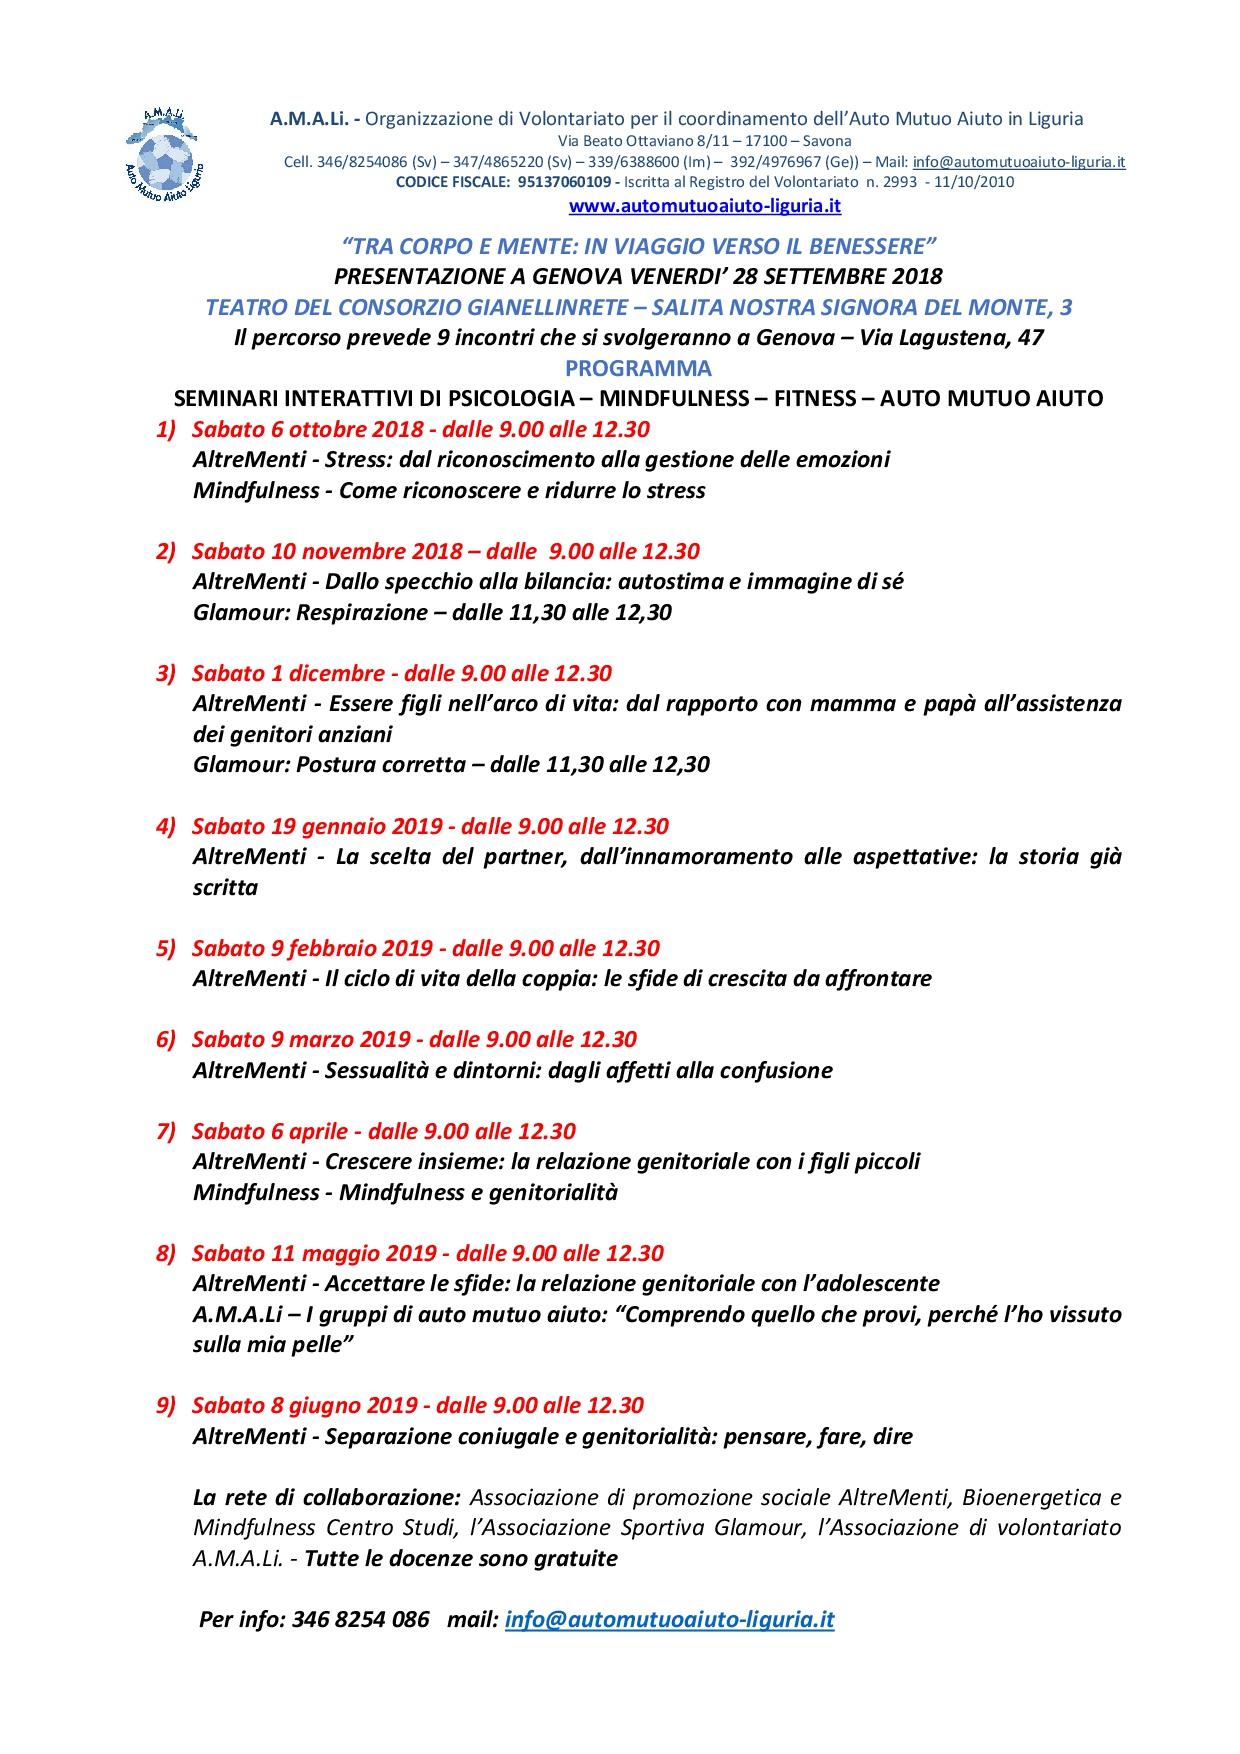 programma-definitivo-seminari